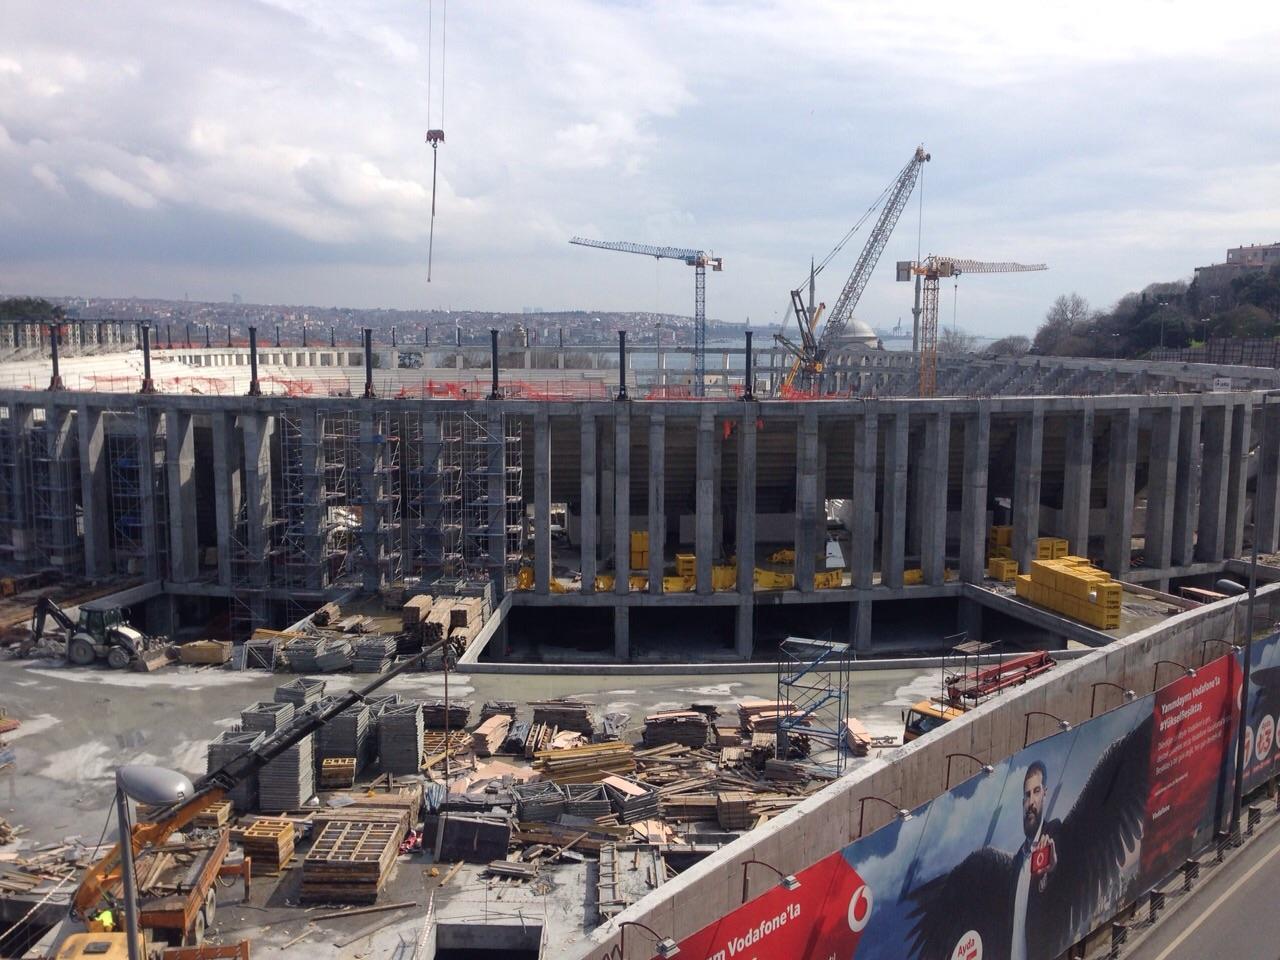 vodafone arena 15.00 29 Mart 2015 (19)